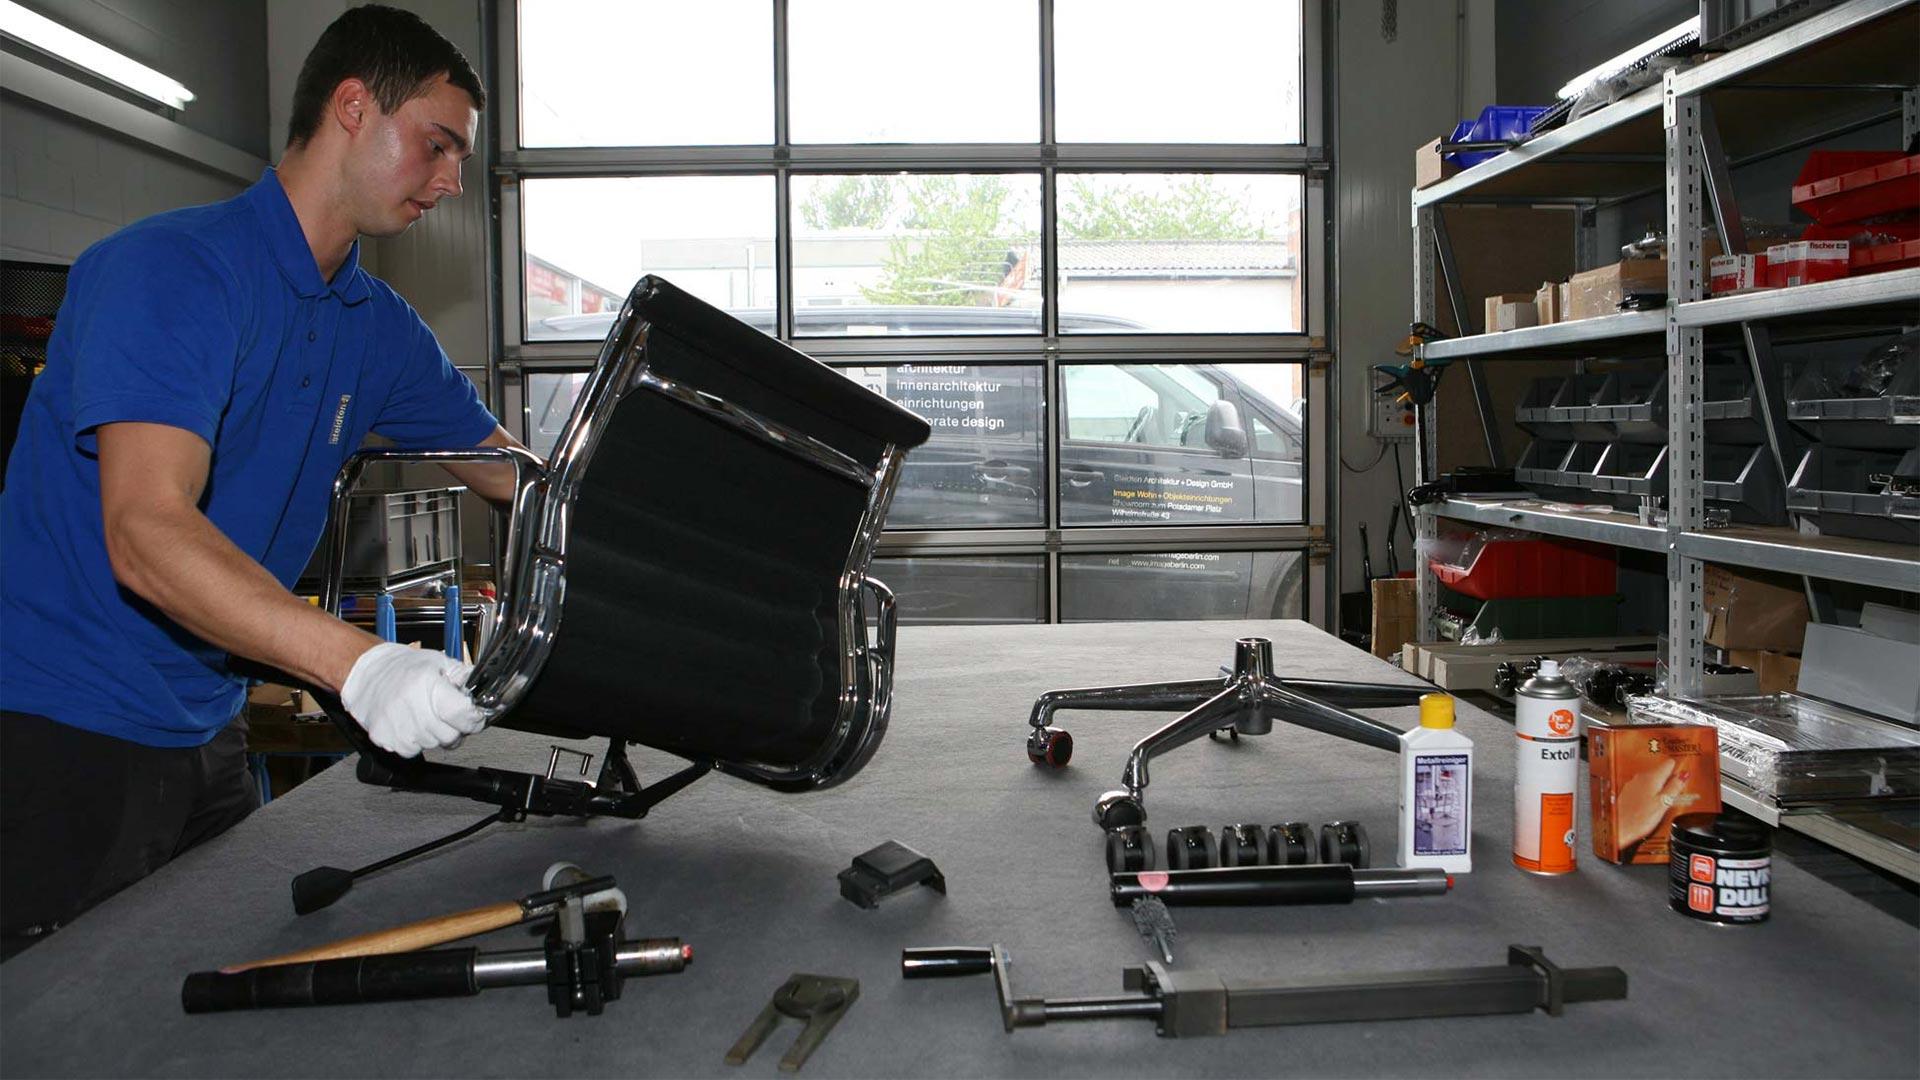 Vitra Ersatzteilservice + Reparatur Eames alu Chair in Berlin bei steidten+05